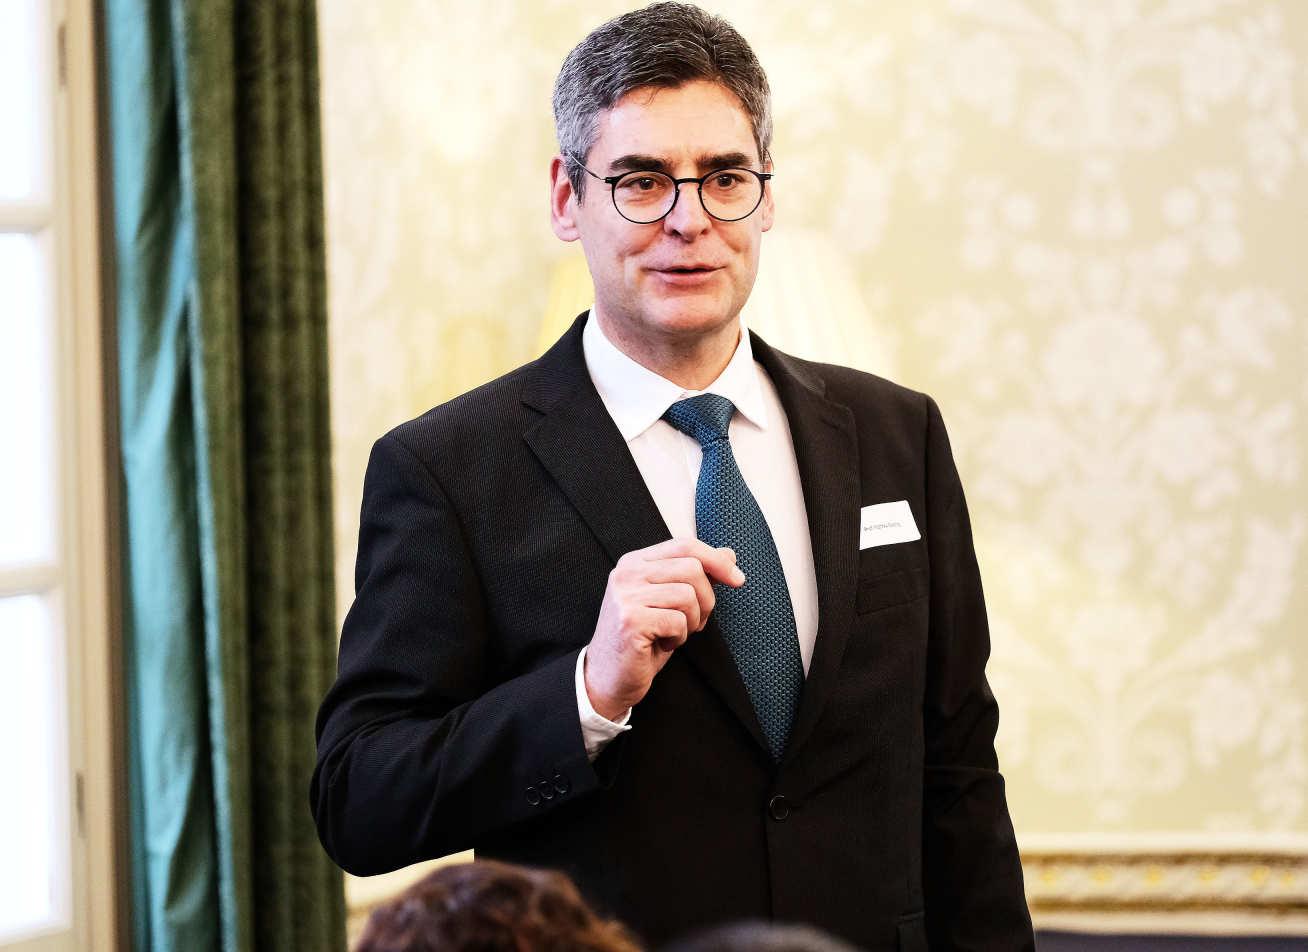 Professor Matthew Pickering, Co-Director of the Imperial 4i Clinician Scientist Training Scheme